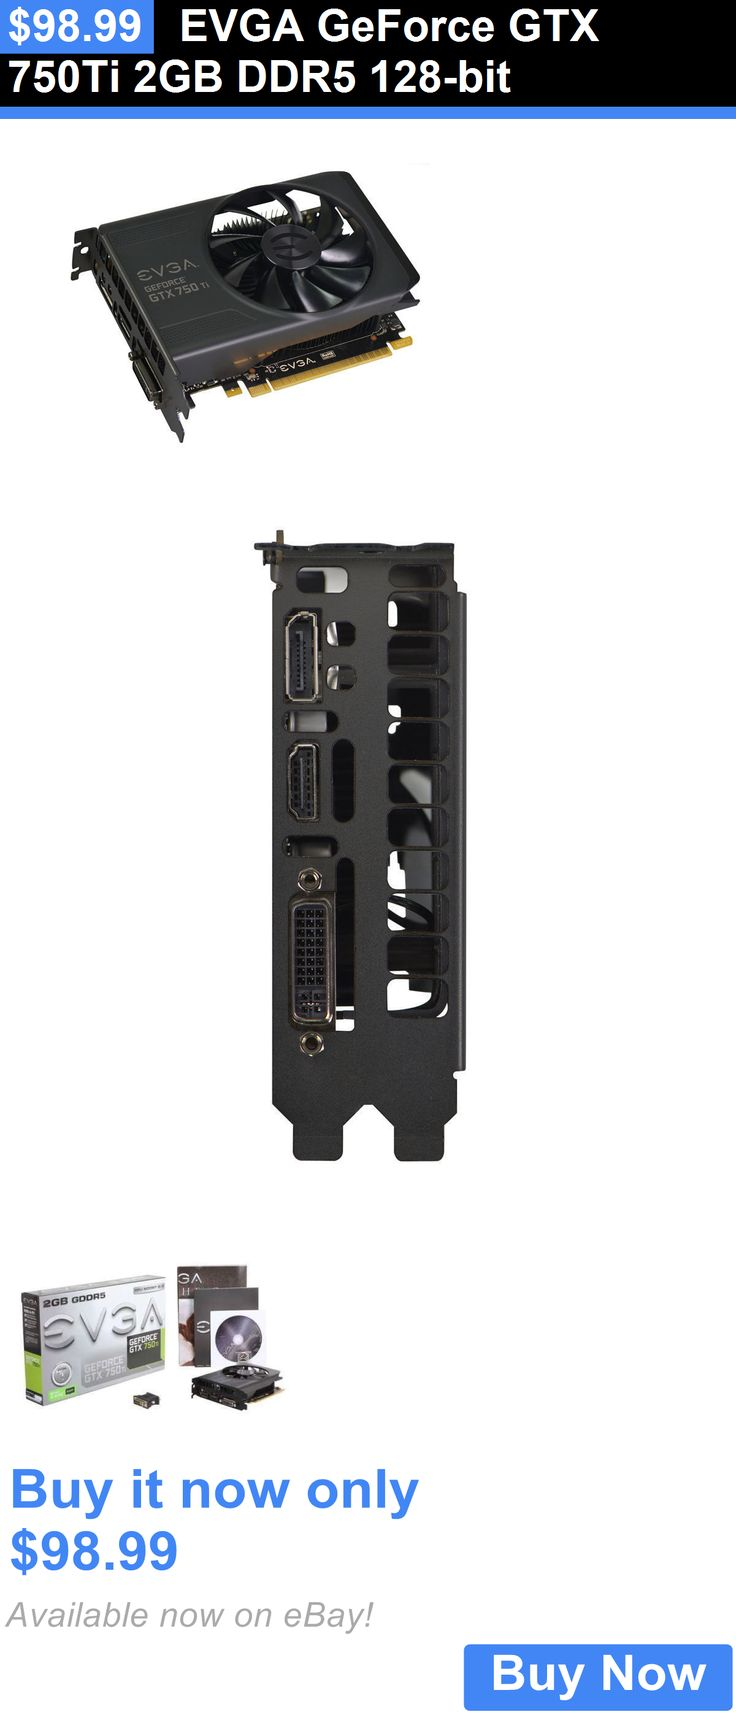 computer parts: Evga Geforce Gtx 750Ti 2Gb Ddr5 128-Bit BUY IT NOW ONLY: $98.99